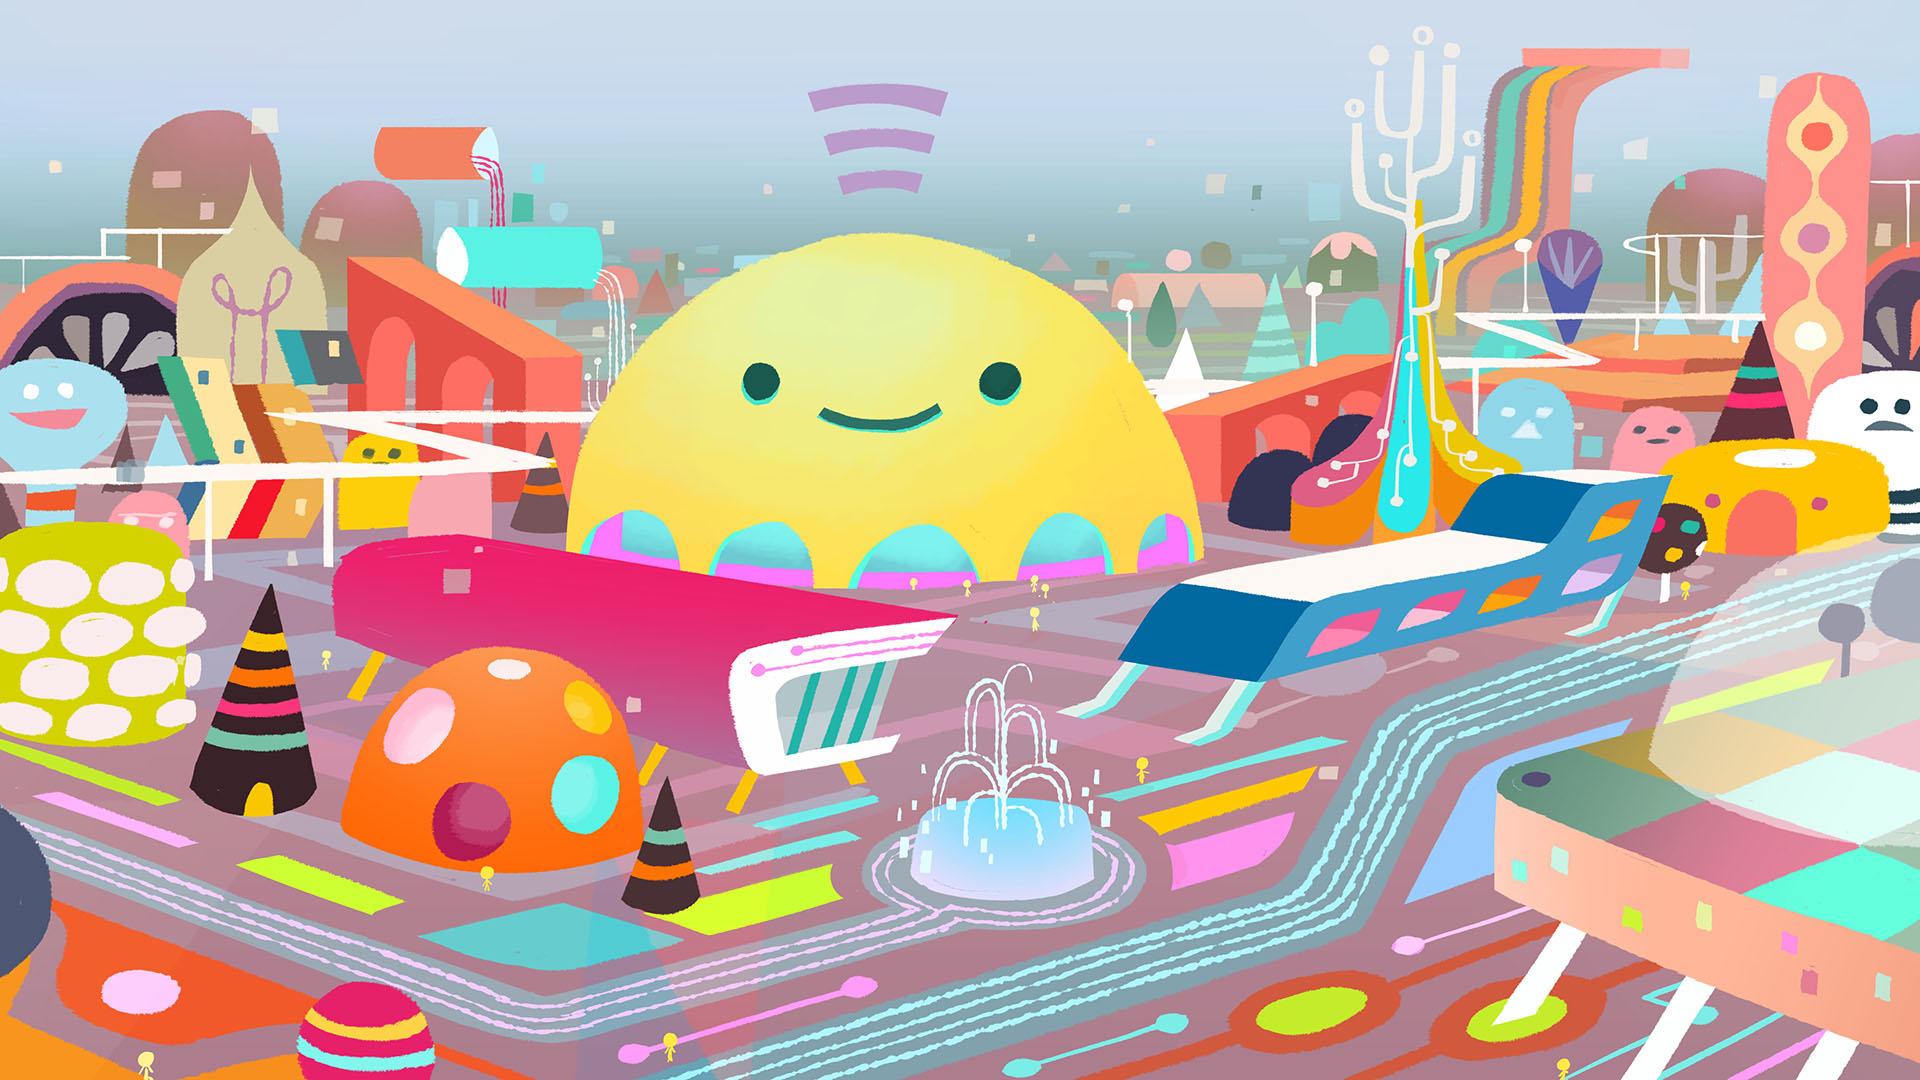 Early emoji city exploration